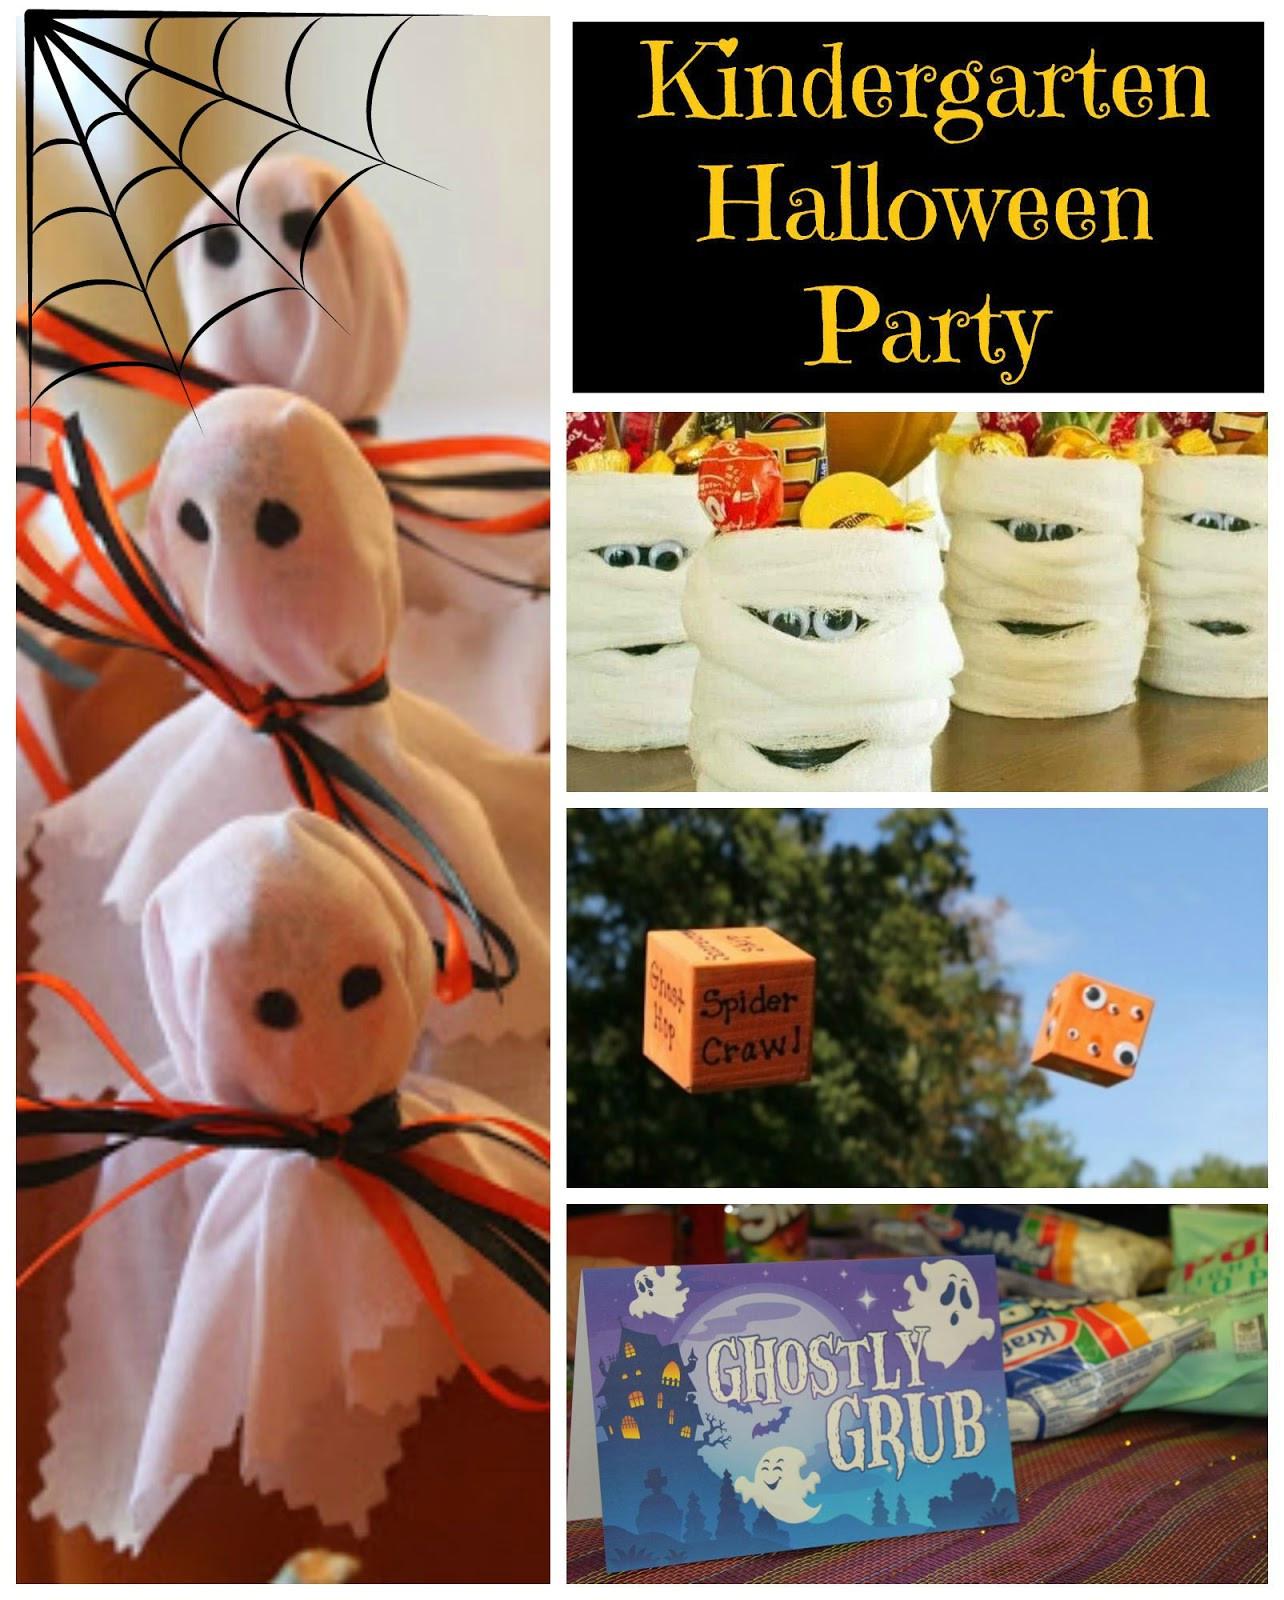 Kindergarten Halloween Party Ideas  Keeping up with the Kiddos Kindergarten Halloween Party